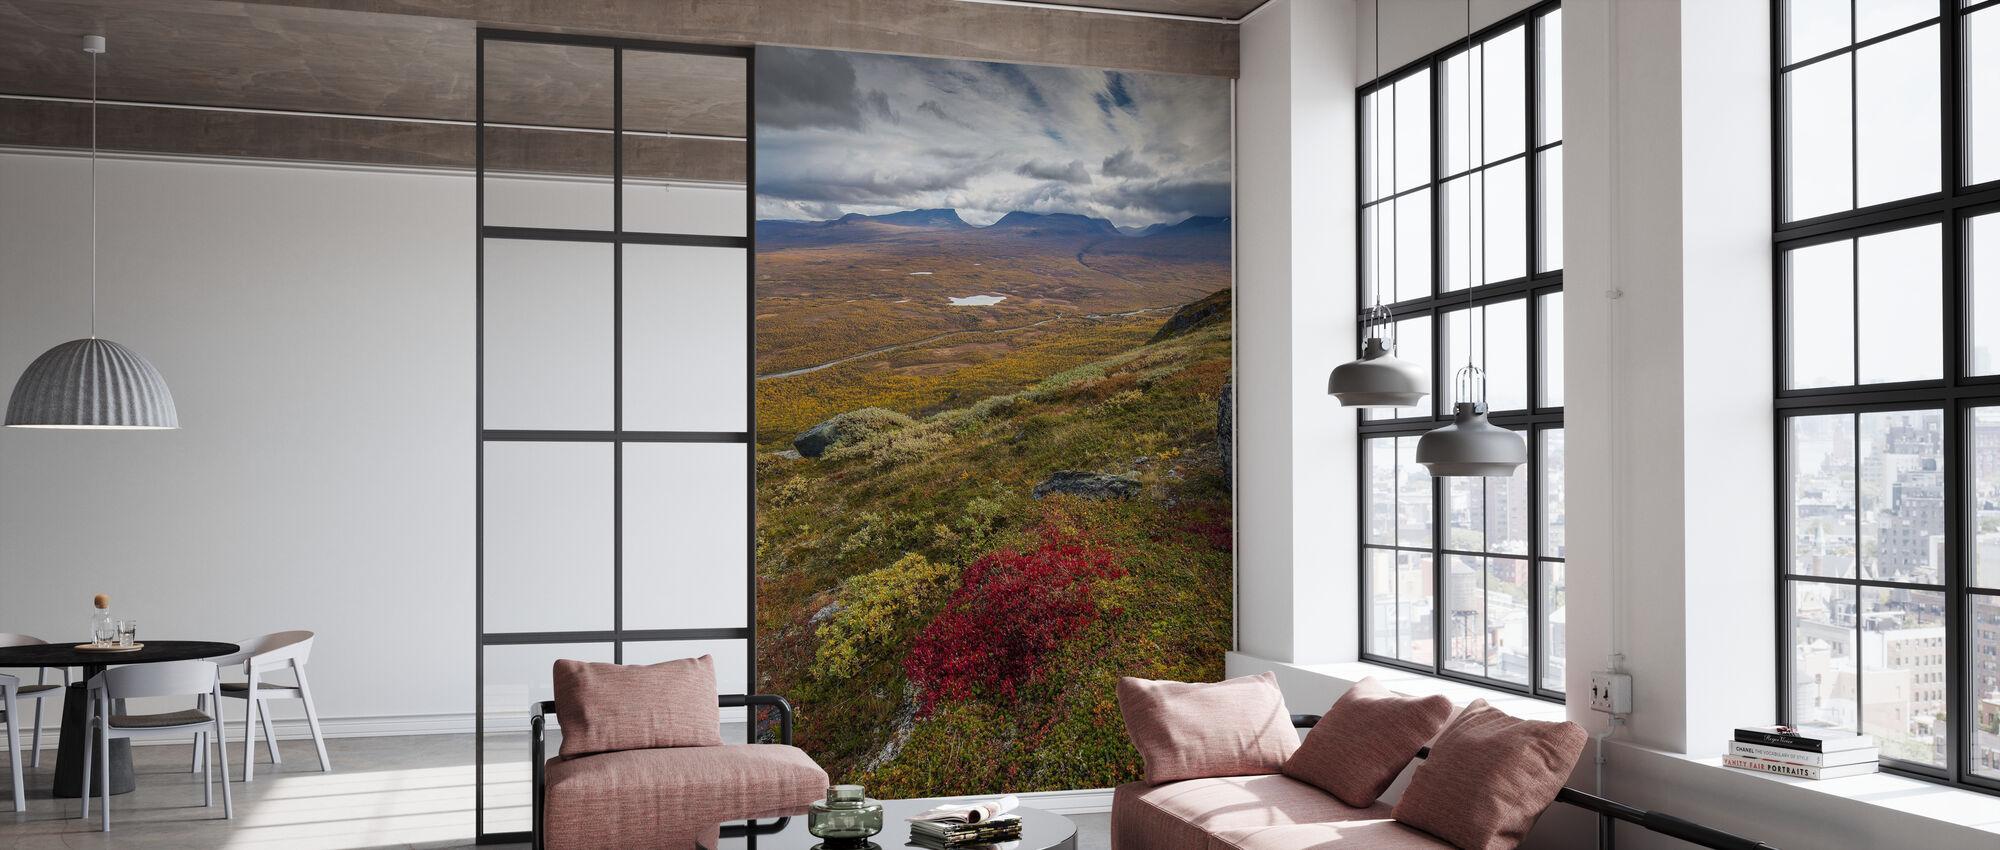 Nuolja Mountain, Abisko - Sweden - Tapet - Kontor